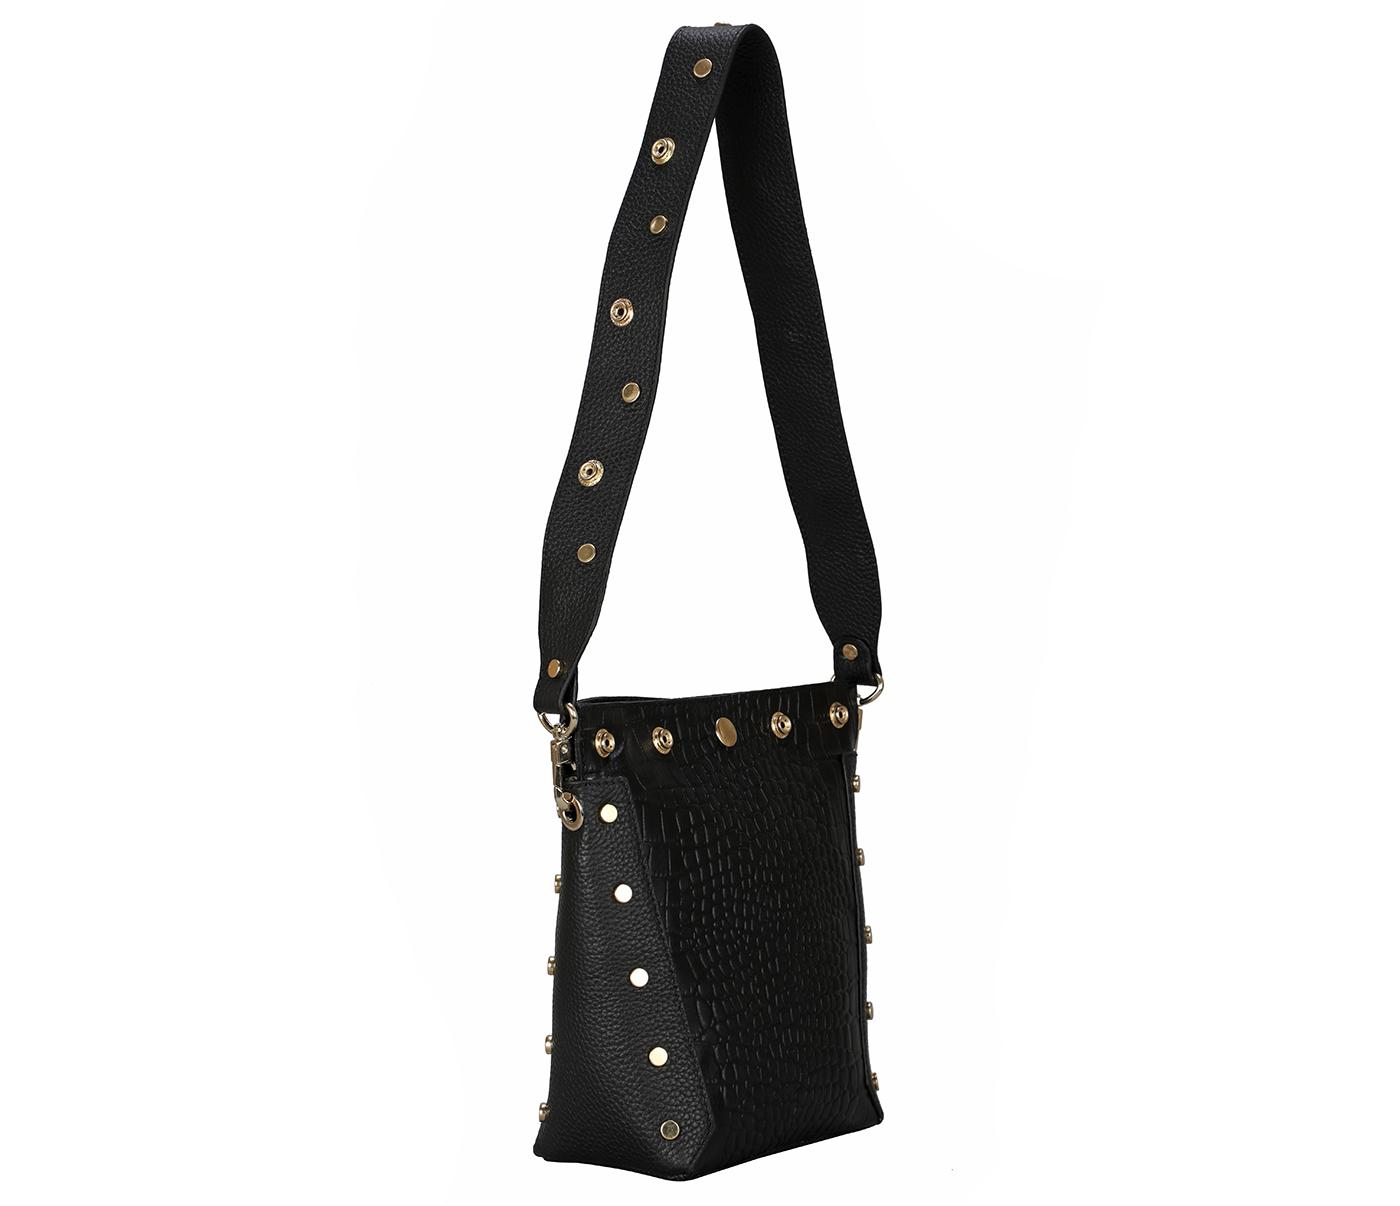 B876-Valencia-Shoulder work bag in Genuine Leather - Black